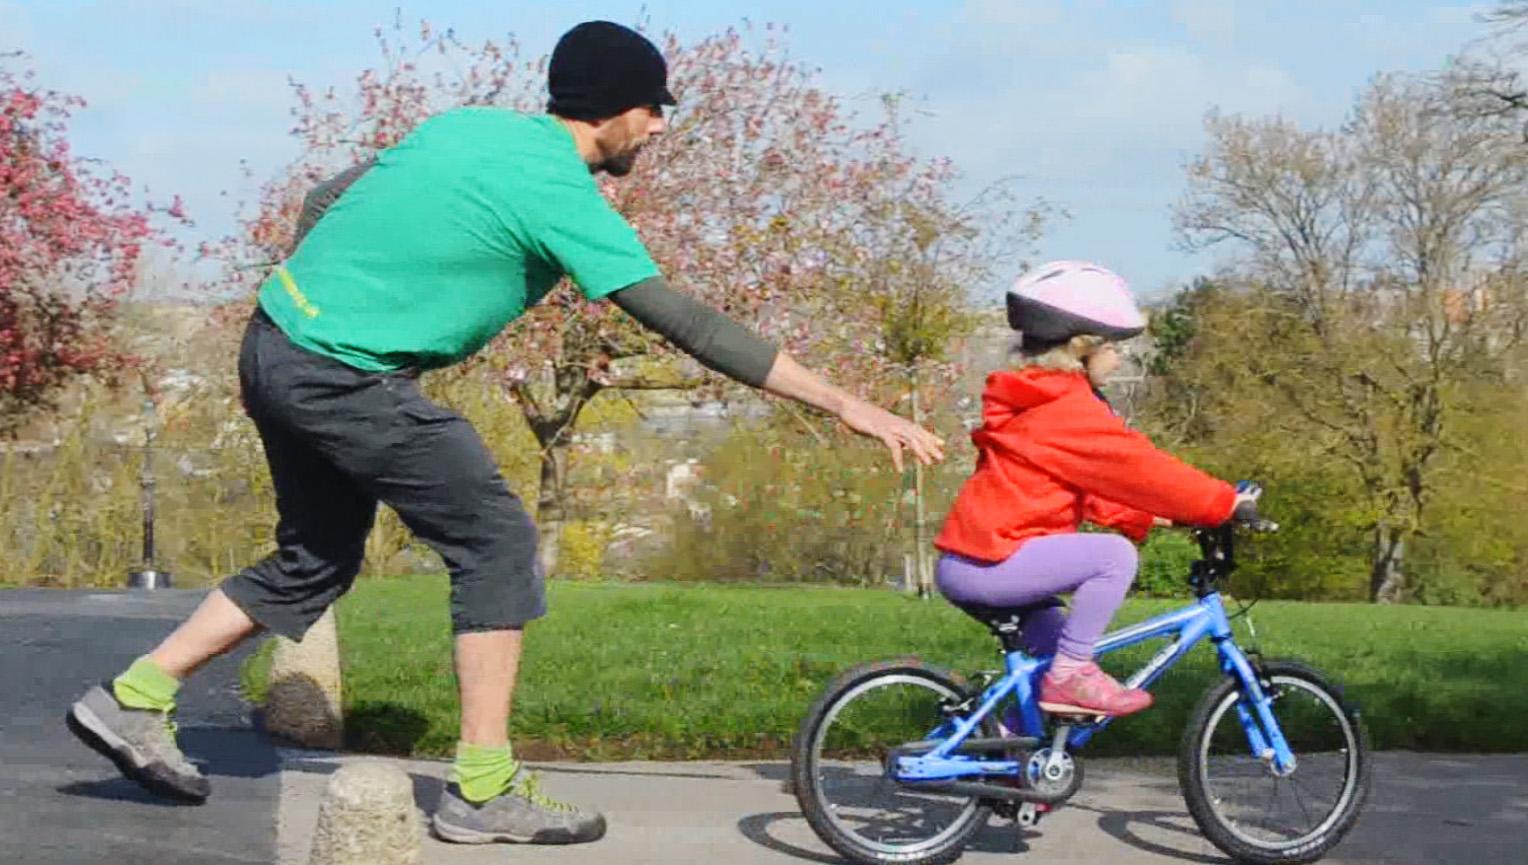 Letting Go Of The Bike Jeff Nischwitz